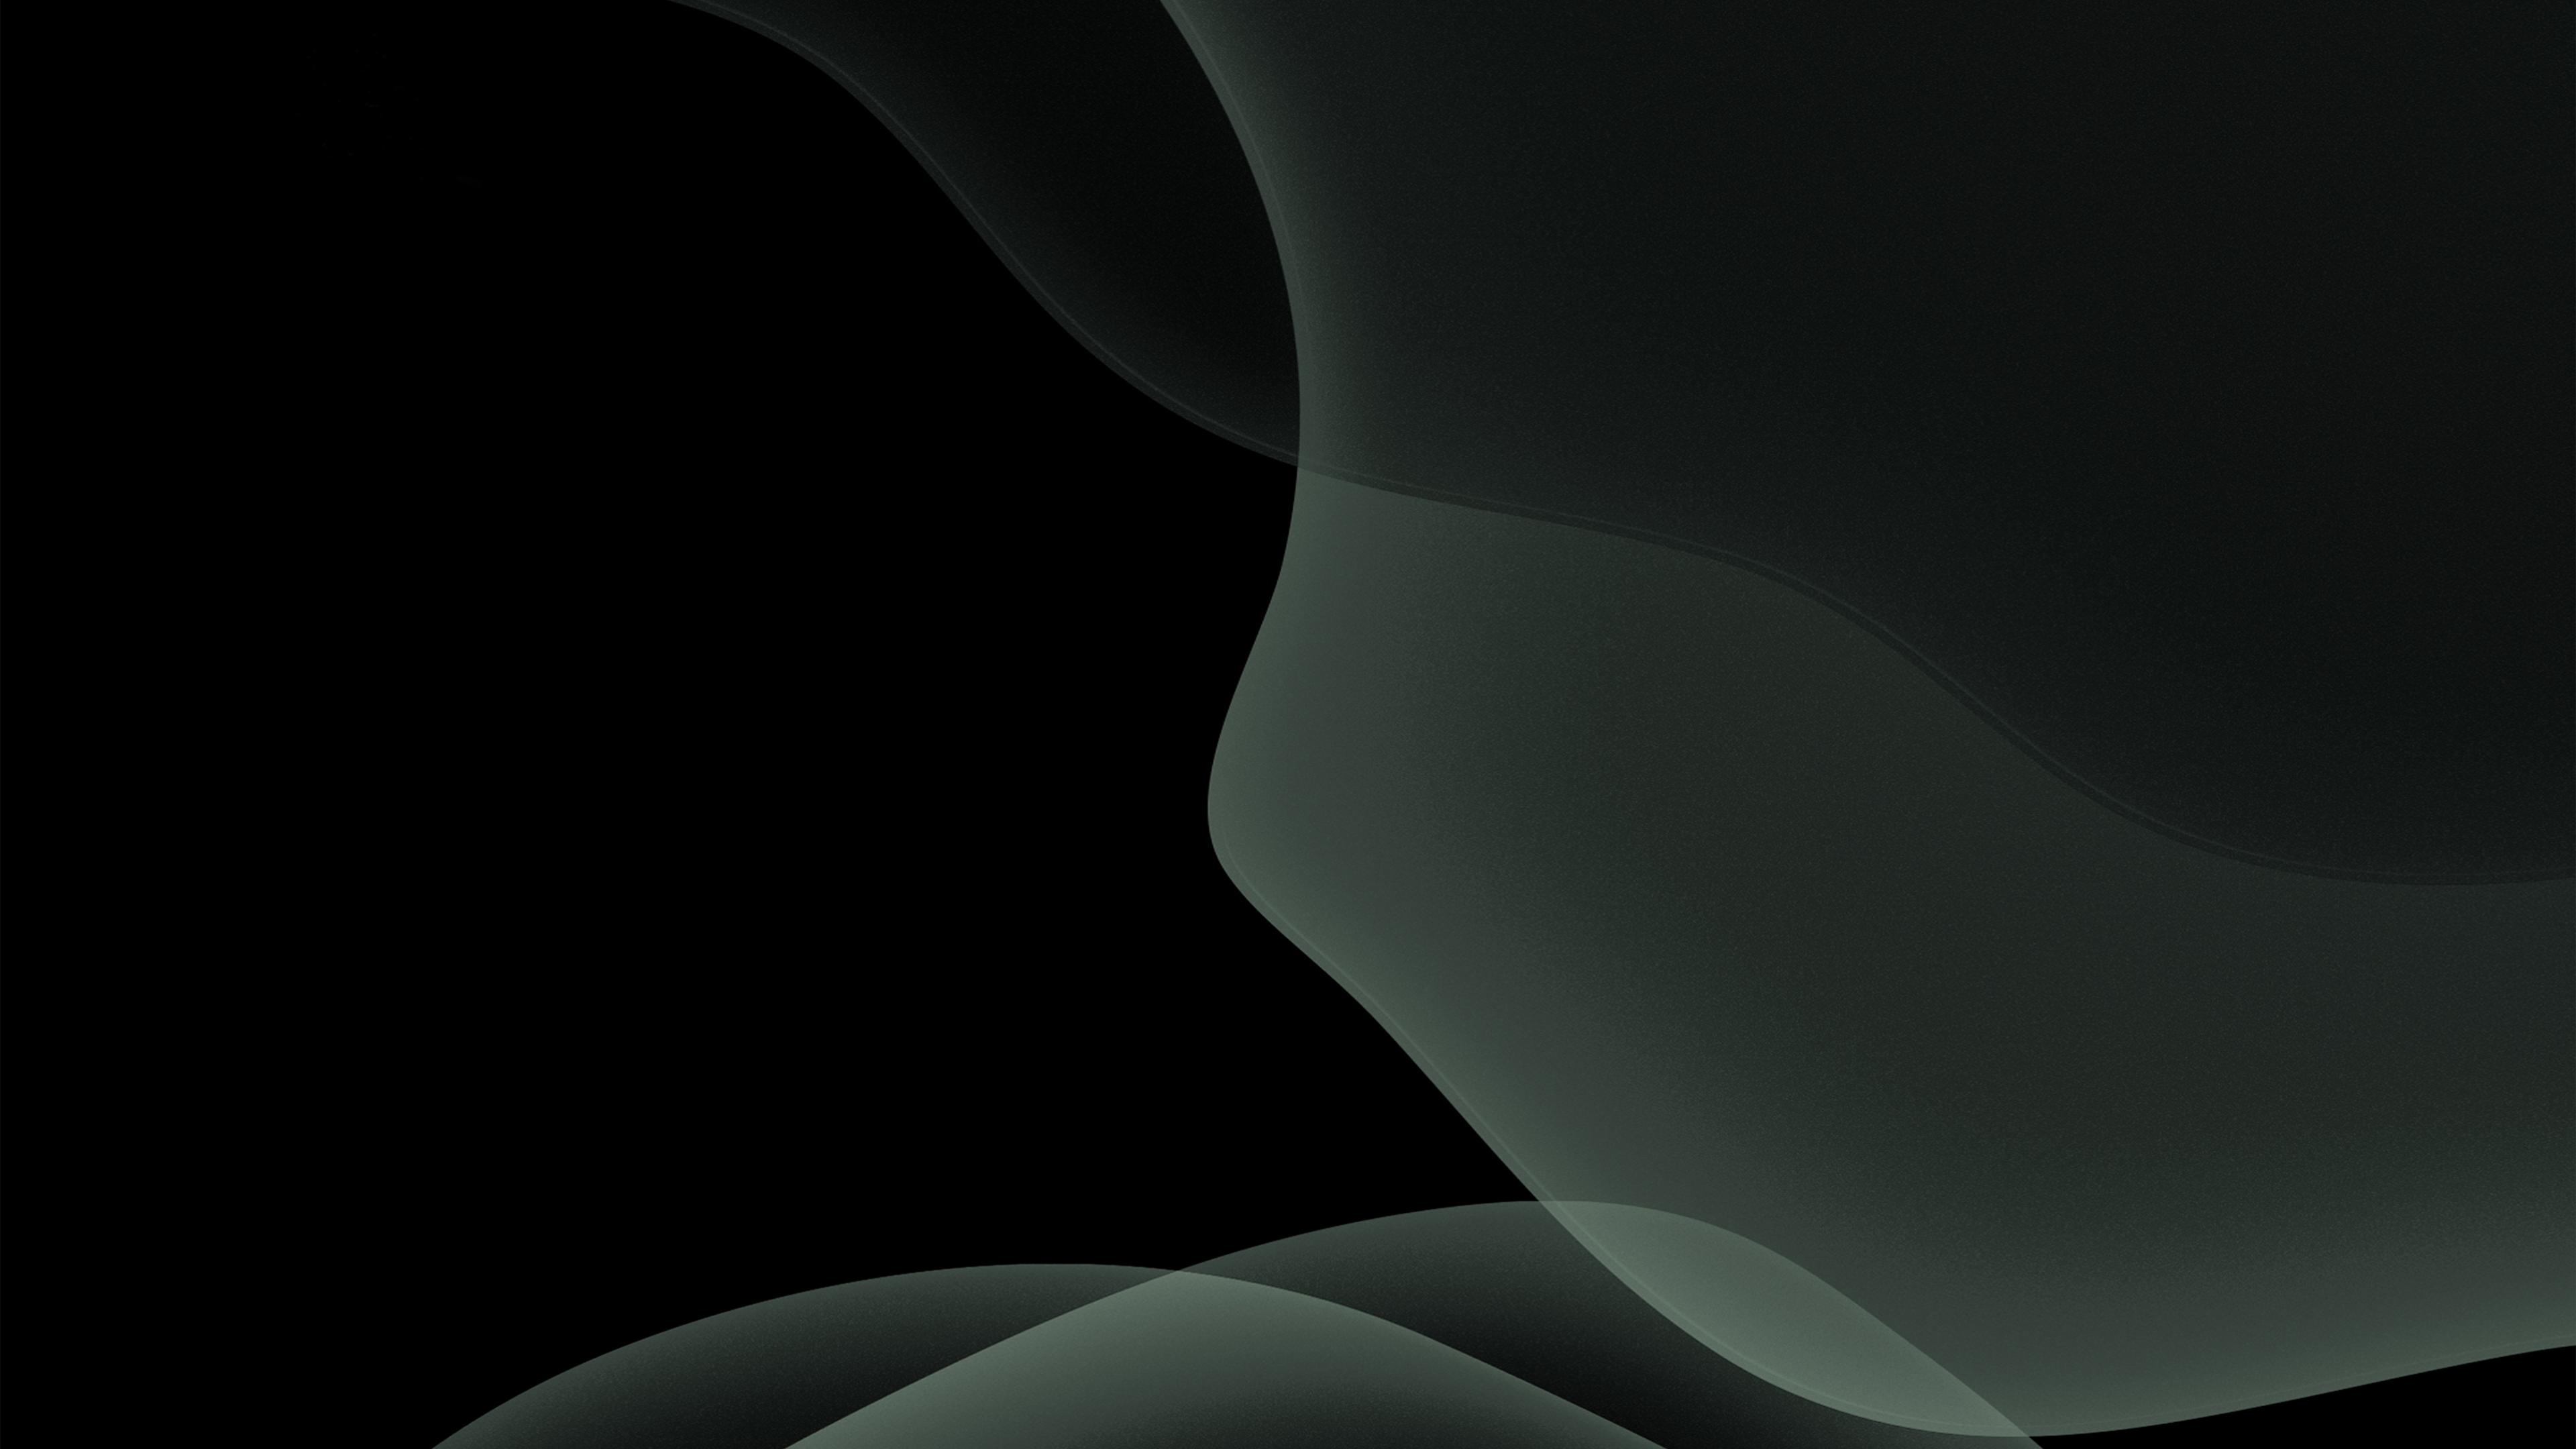 apple wallpaper,black,light,darkness,architecture,line